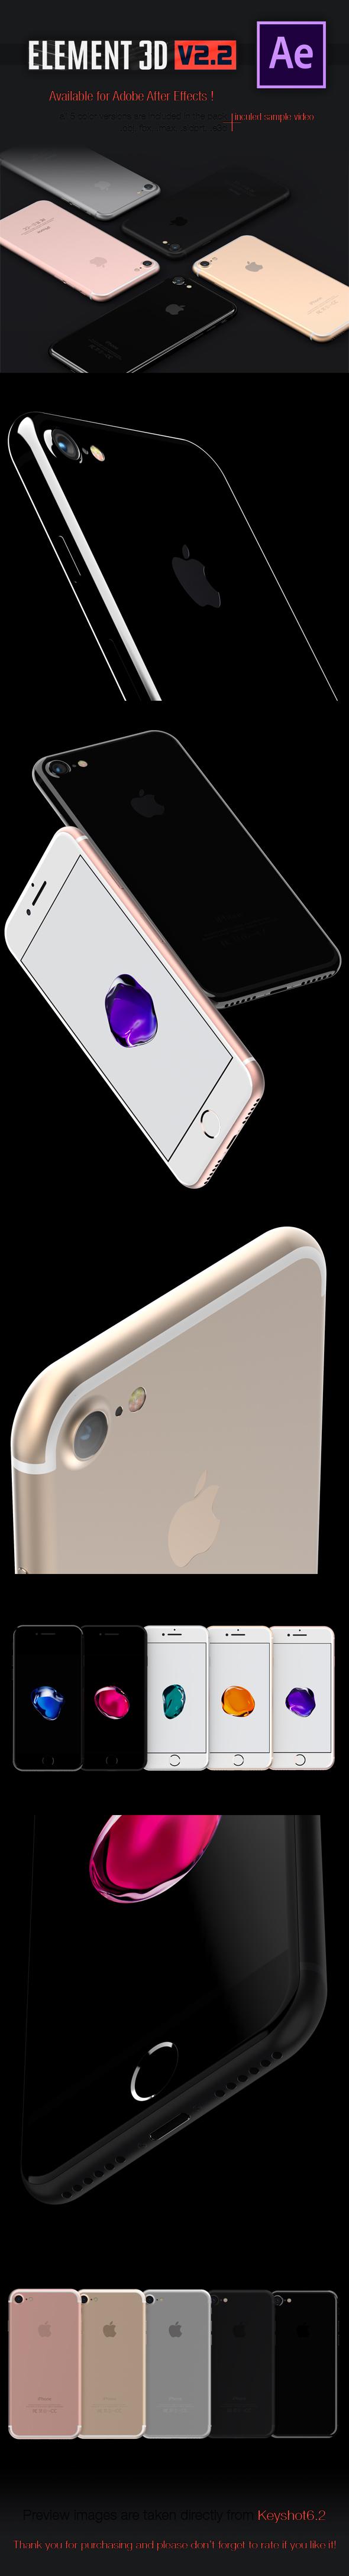 iPhone 7 3DElement - 5 Colours - 3DOcean Item for Sale